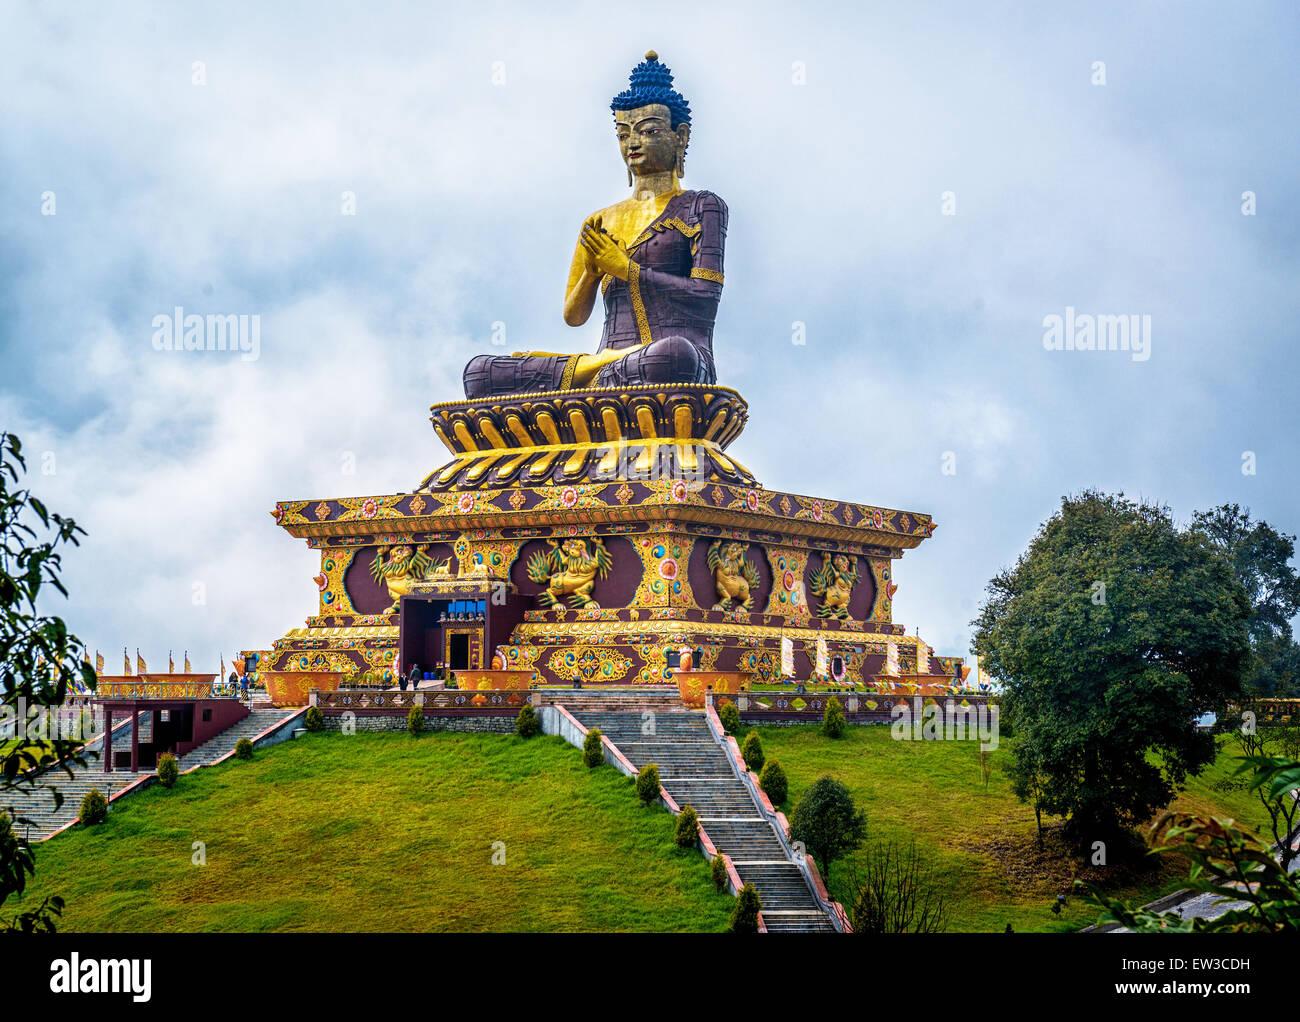 giant Buddha statue at Ravangla, Sikkim, India. - Stock Image